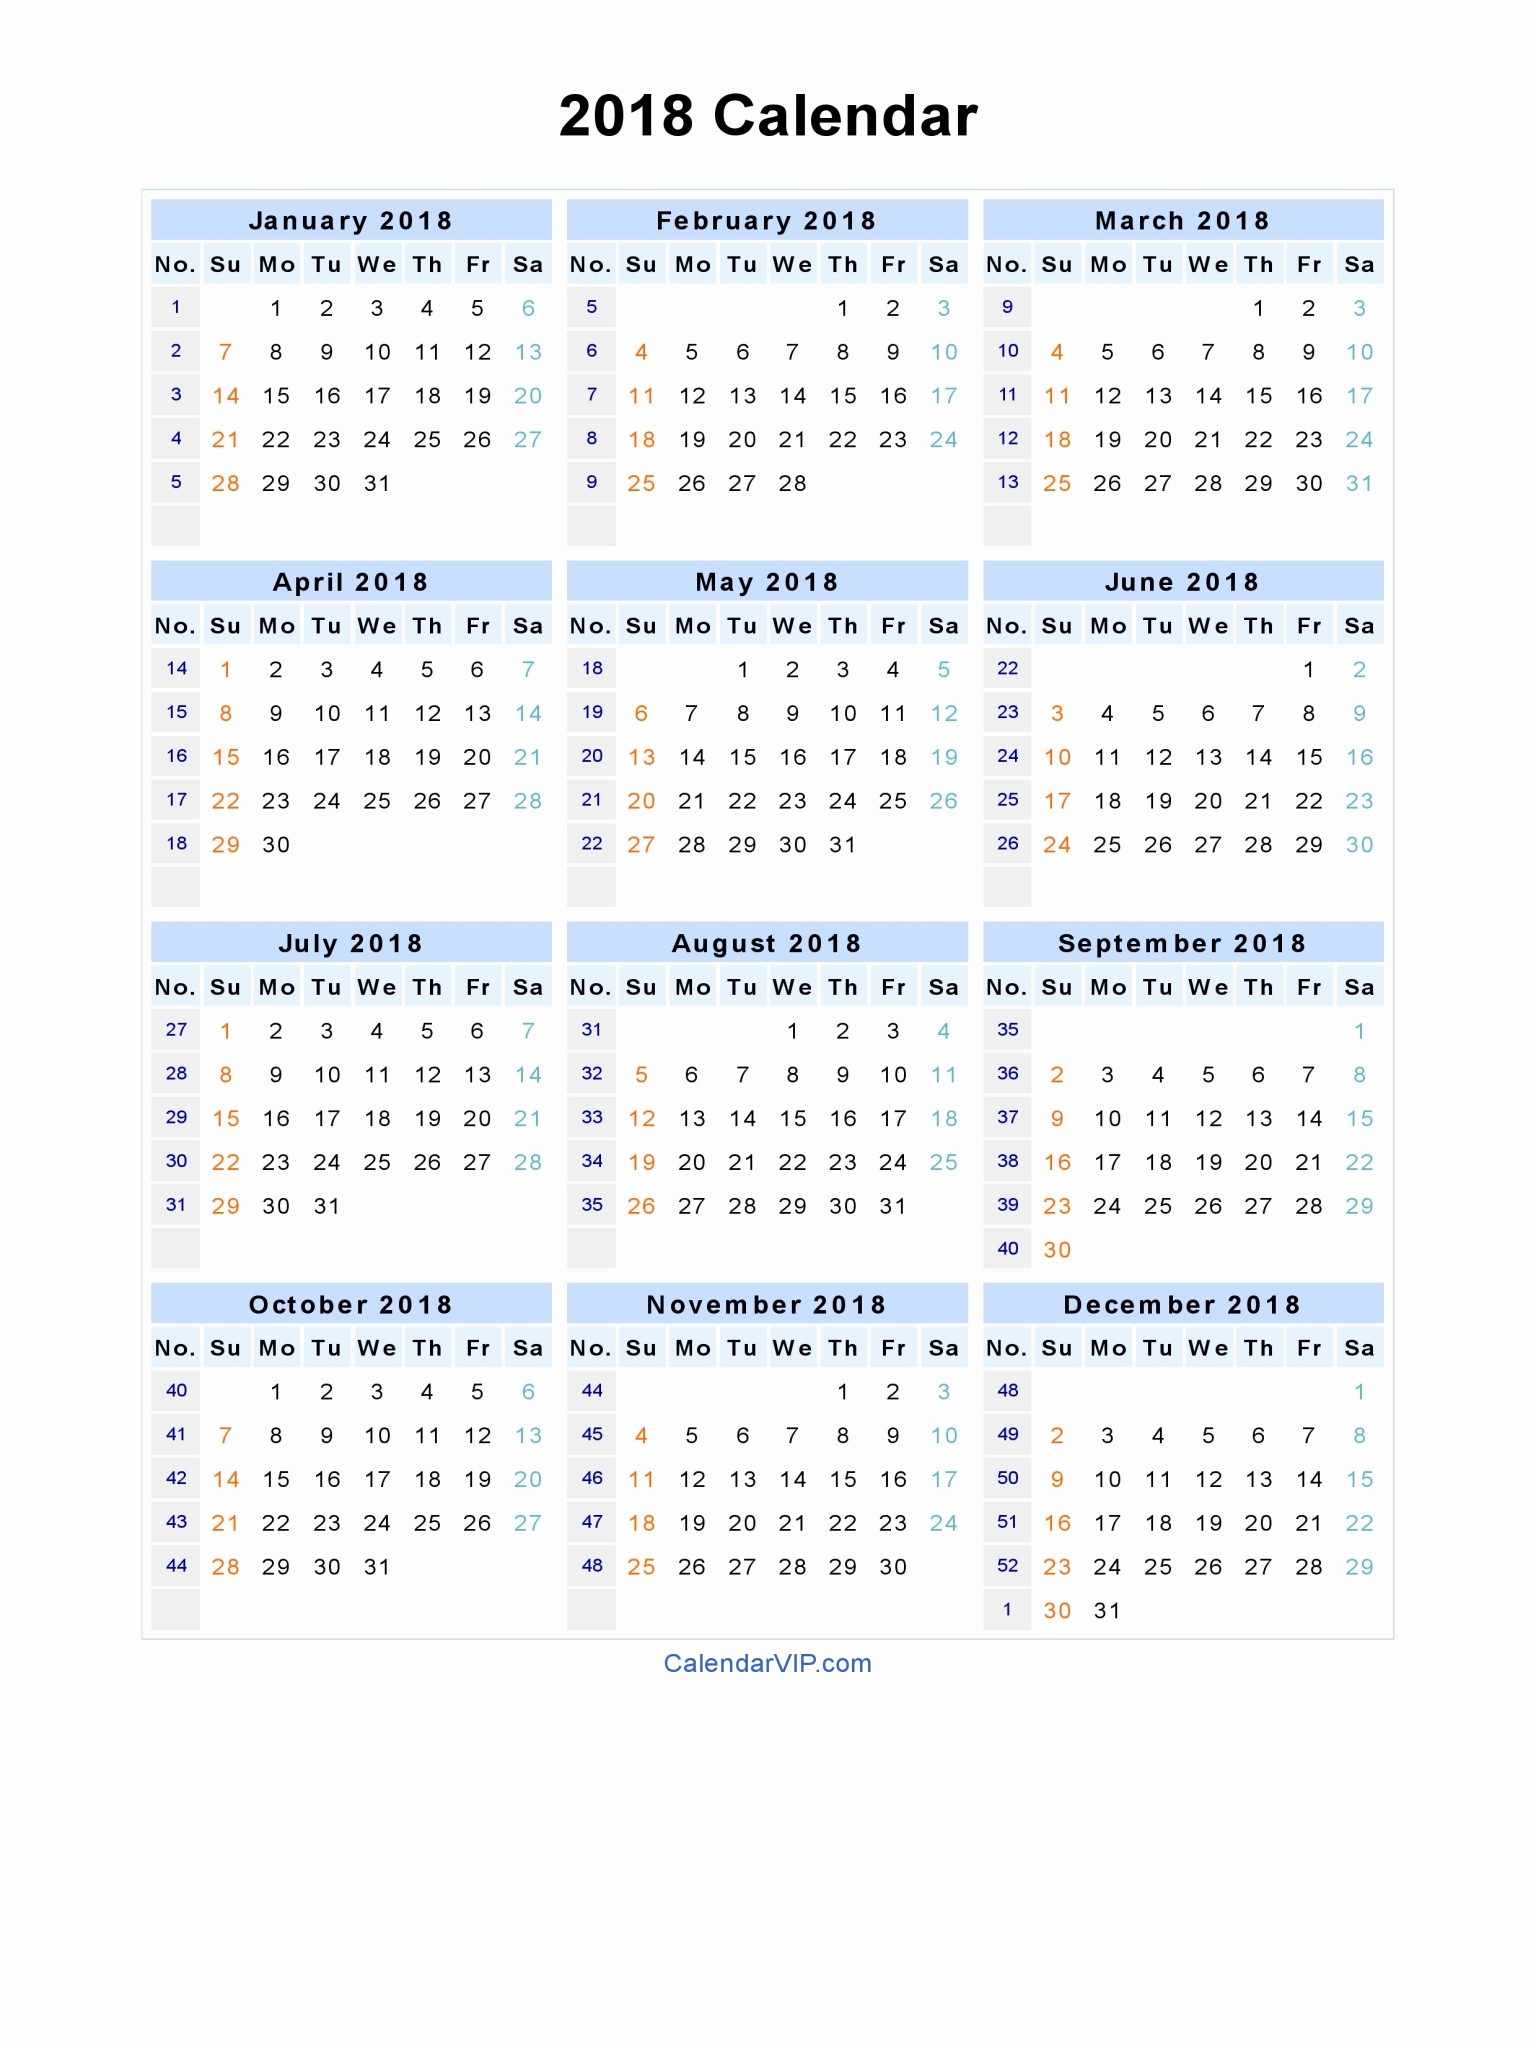 October 2018 Printable Calendar Word Inspirational 2018 Calendar Word